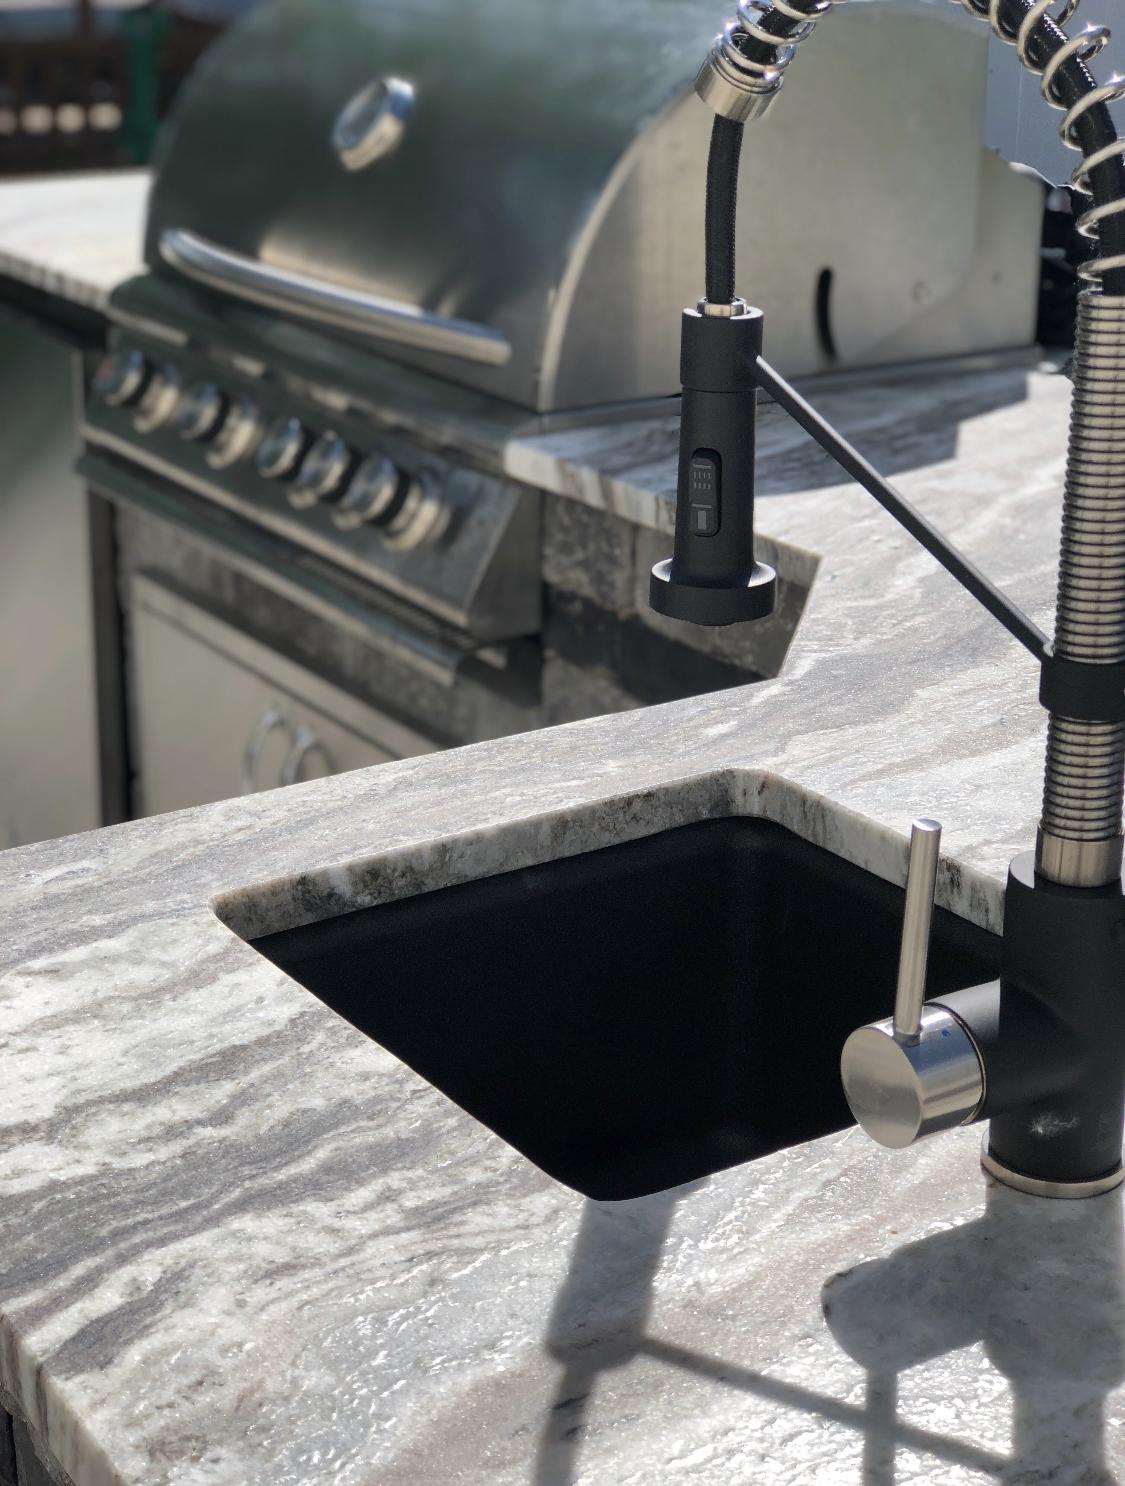 New outdoor kitchen in Halfmoon, NY